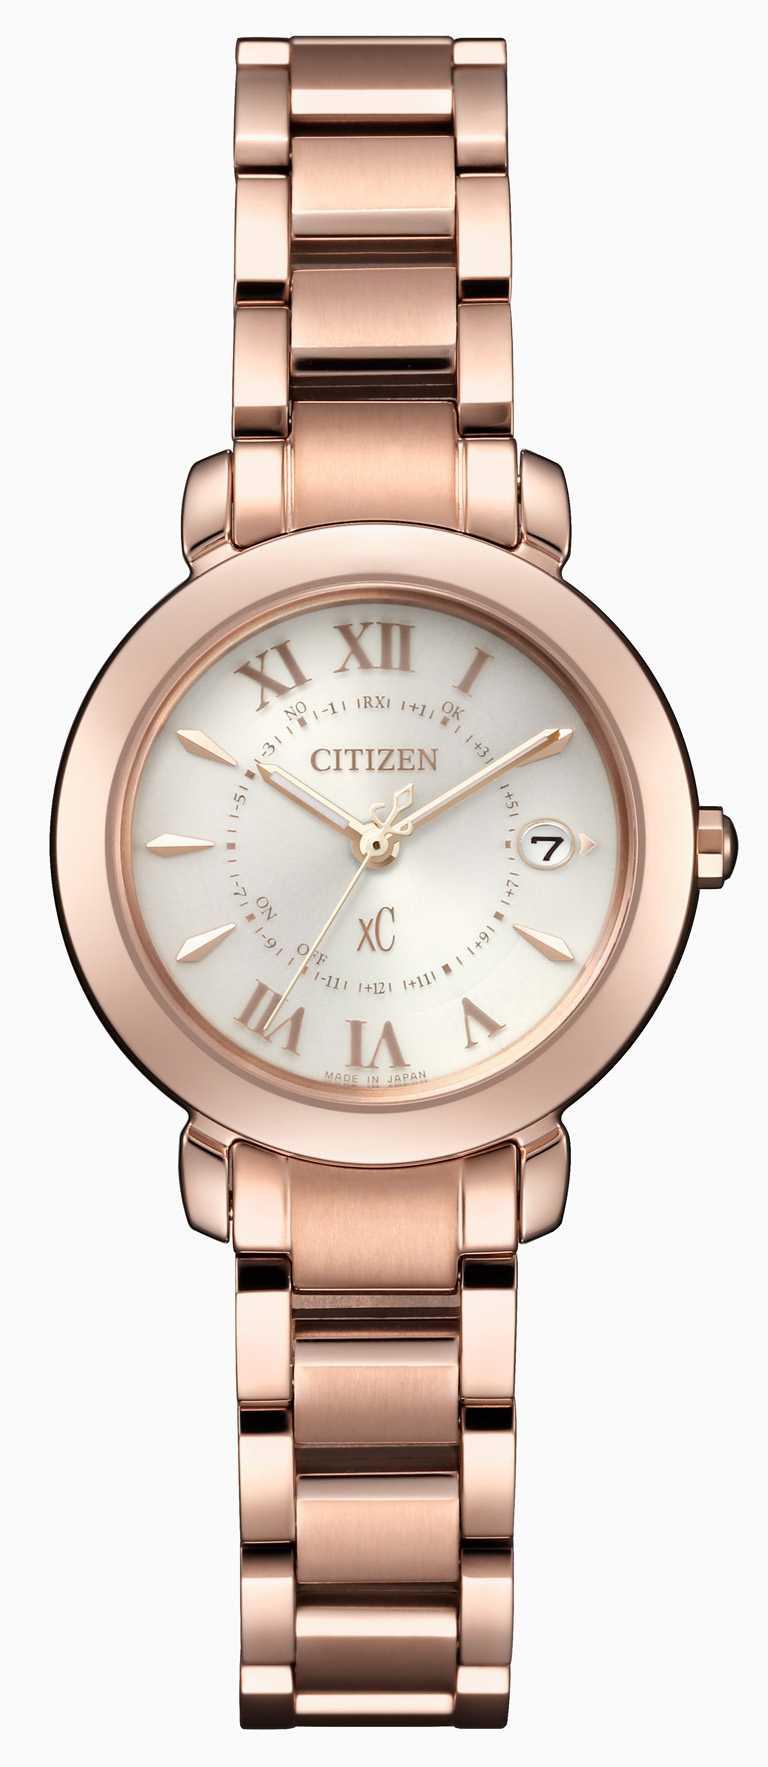 CITIZEN「xC輕奢光系列」ES9442-55A腕錶╱29,900元。(圖╱CITIZEN提供)